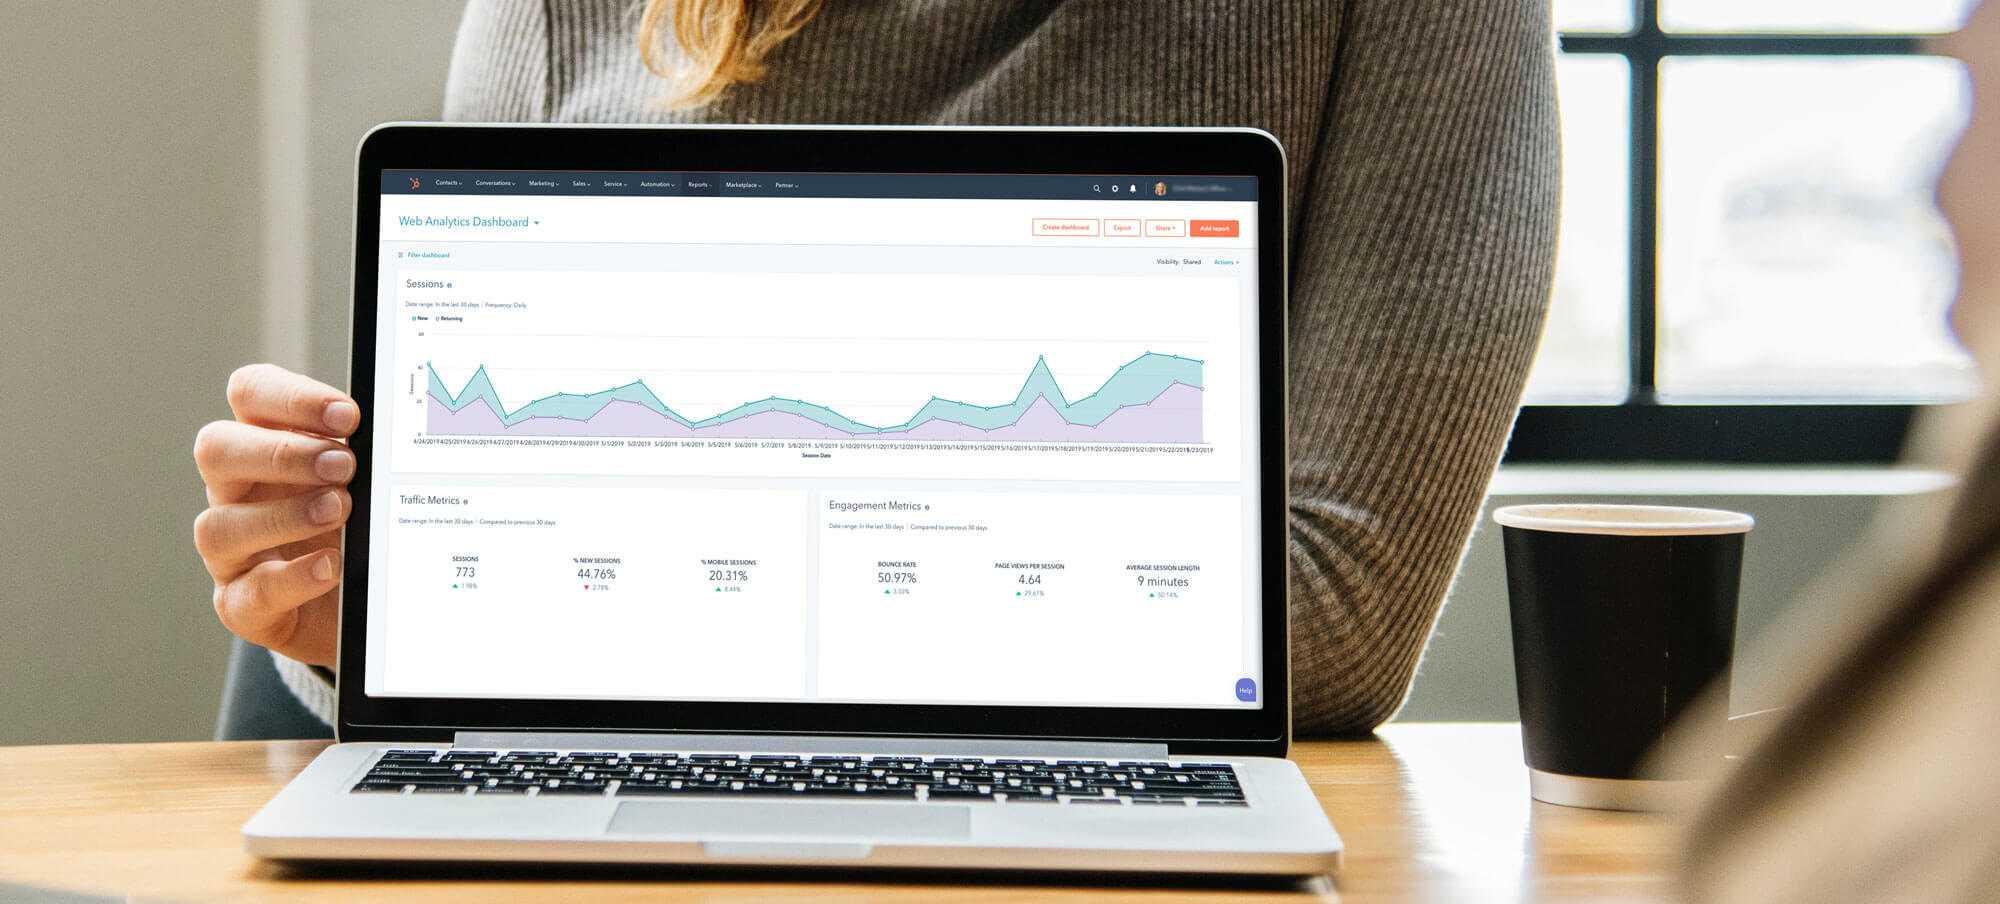 hubspot-consultant-laptop-dashboard-1